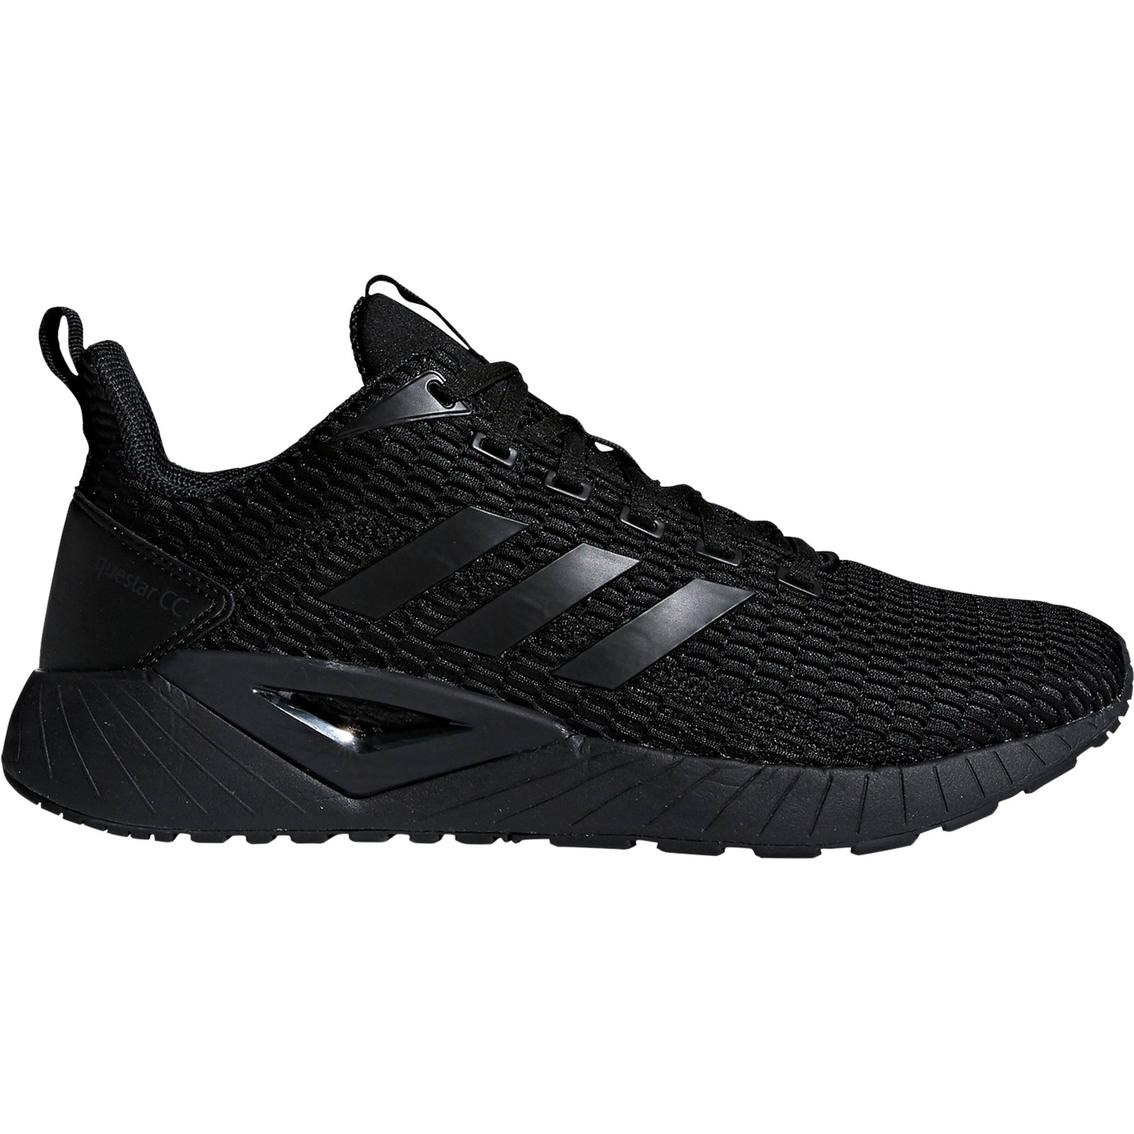 4f814093ddee4f Adidas Men s Questar Cc Running Shoes